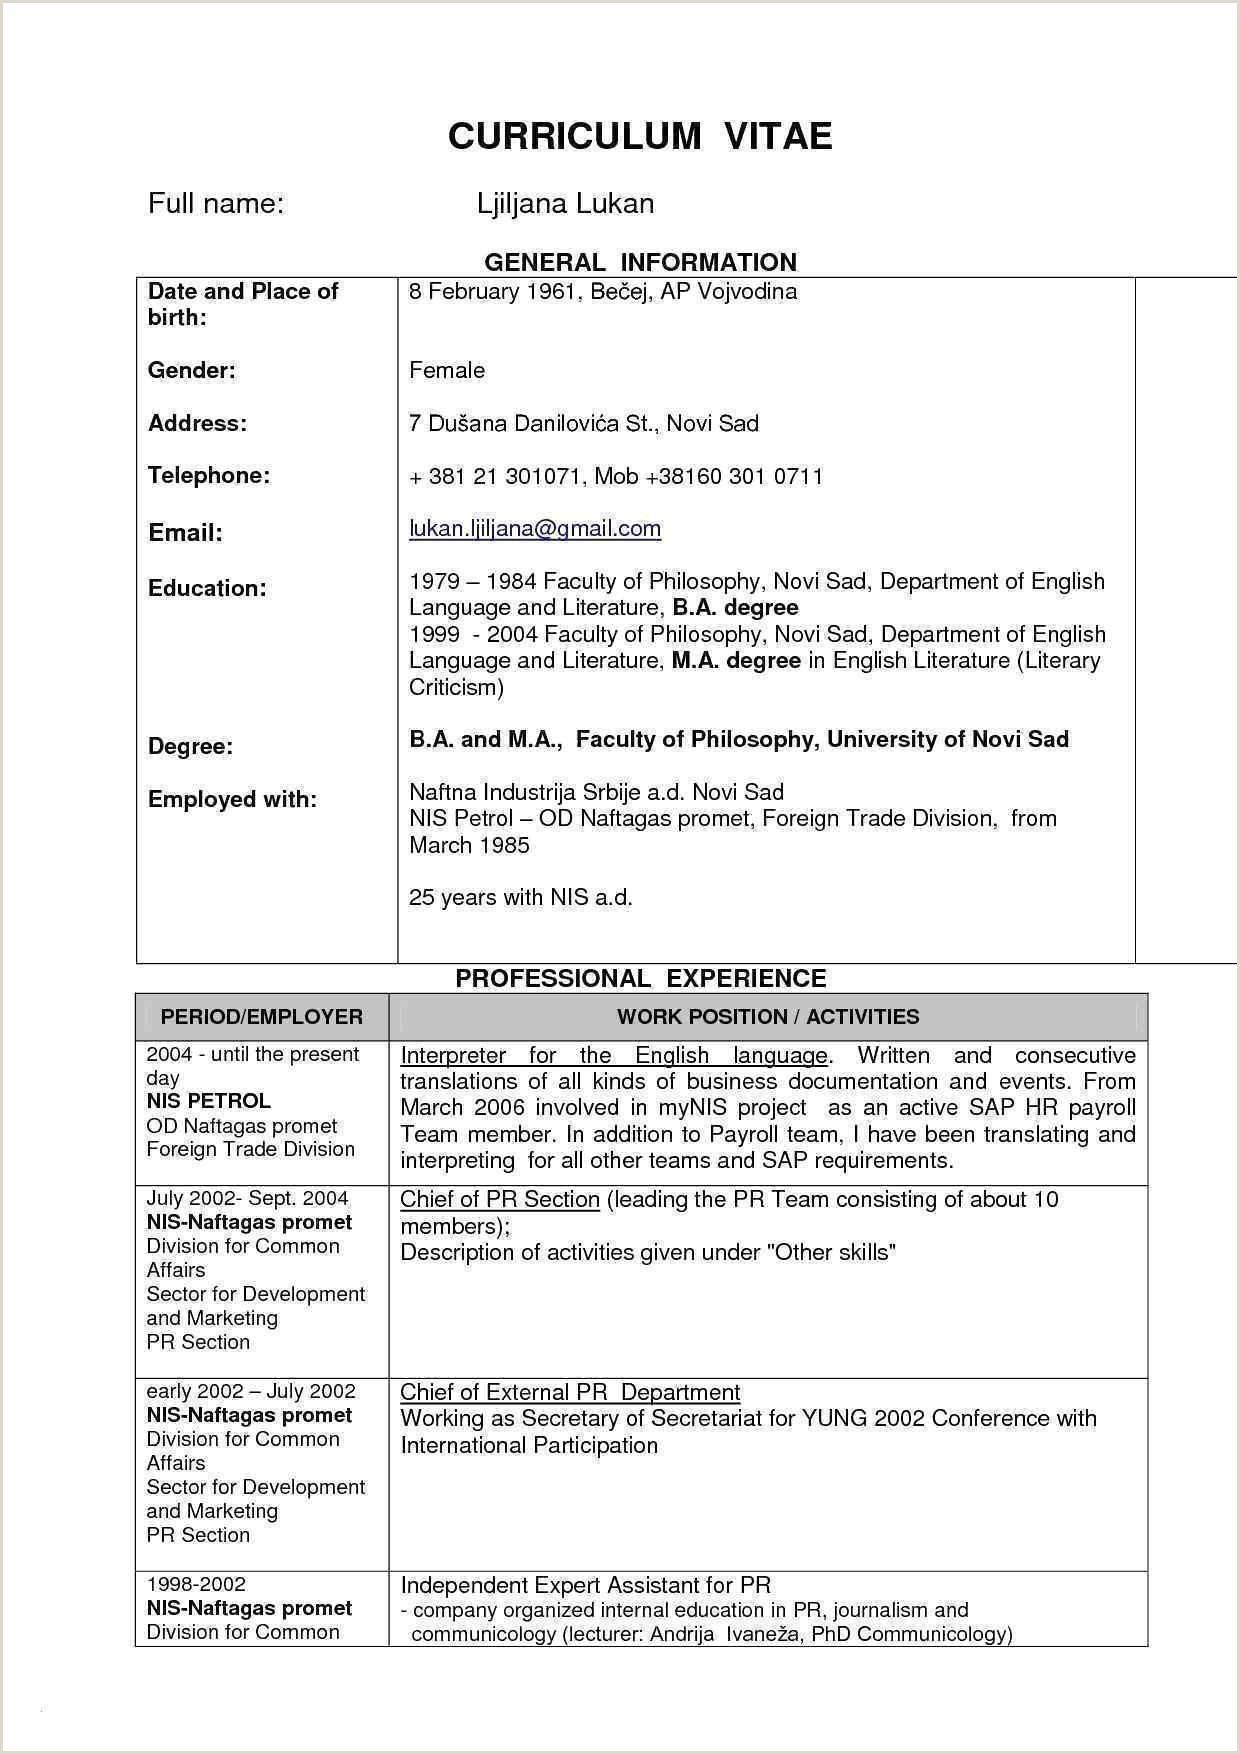 Cv format for Overseas Jobs Fresh Sample Resume for Abroad Job